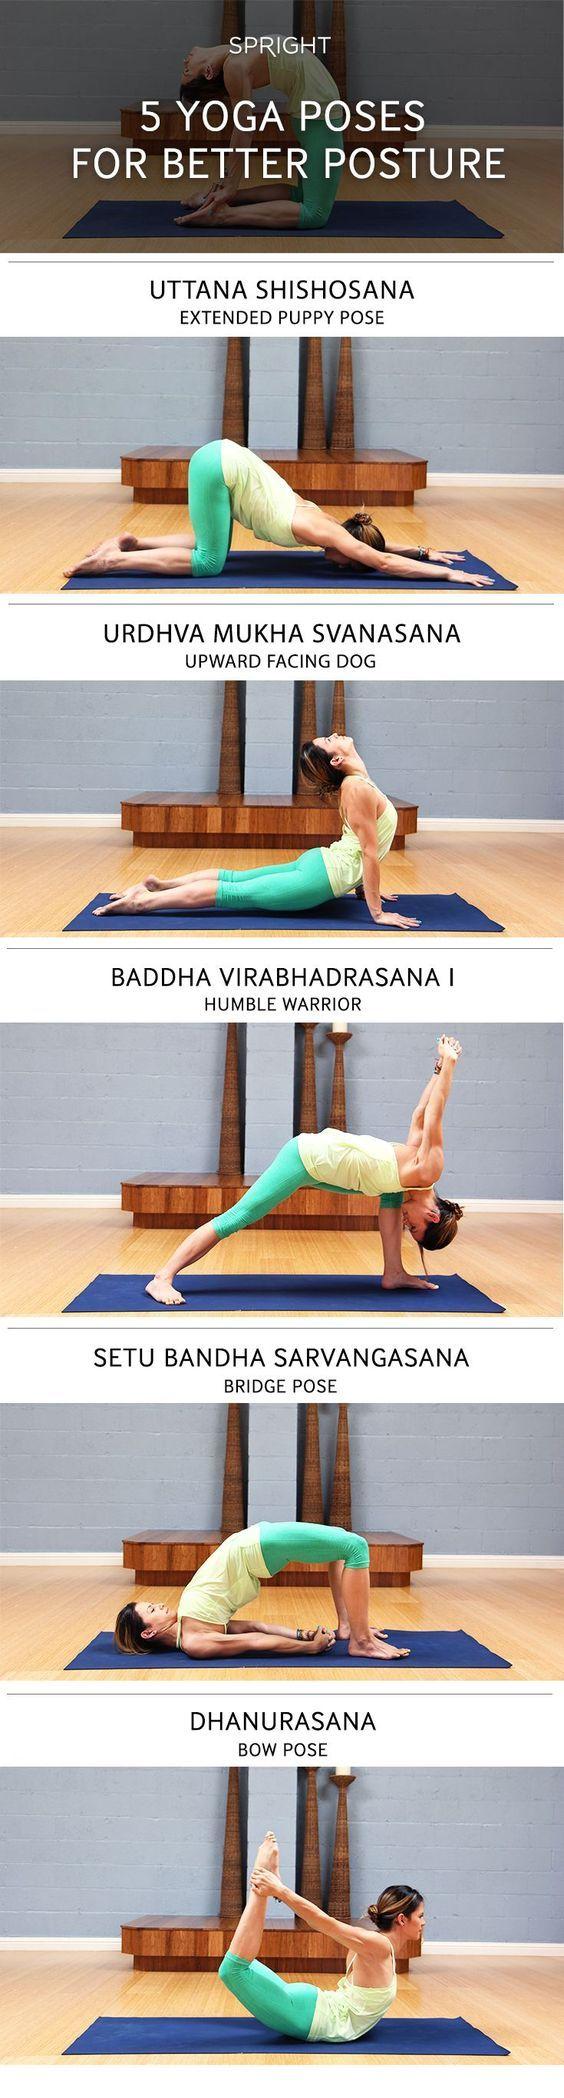 44++ Yoga poses to improve posture inspirations